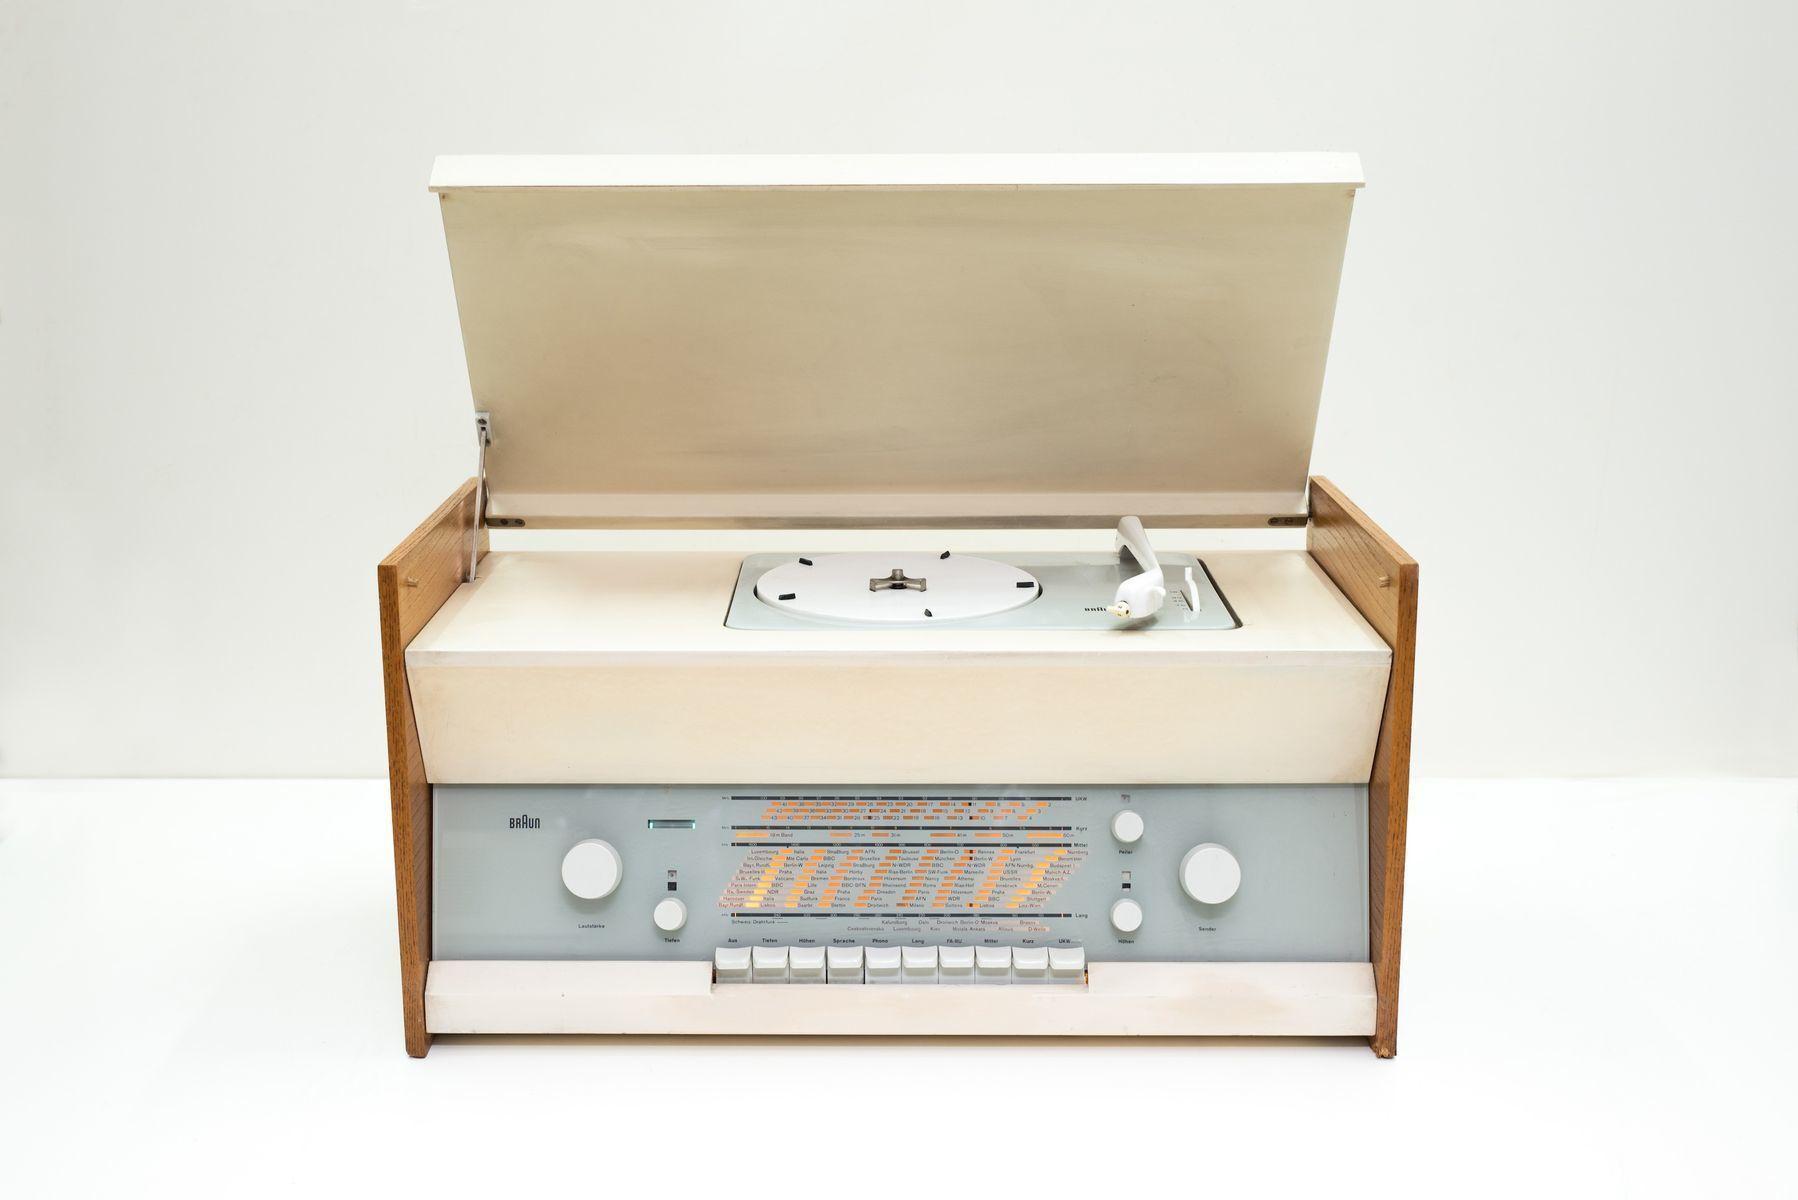 Series Atelier 1 81 Turntable By Dieter Rams For Braun, 1961